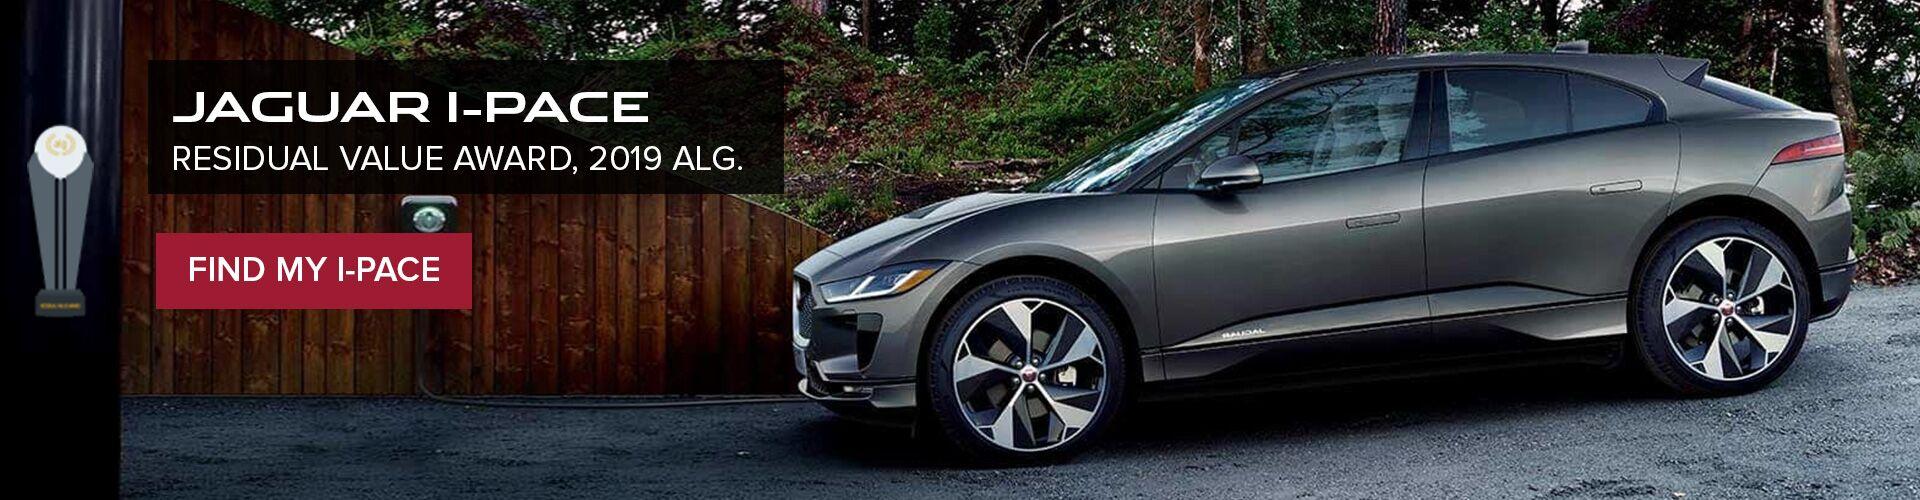 Kansas City Kansas Jaguar Dealership | Jaguar Merriam